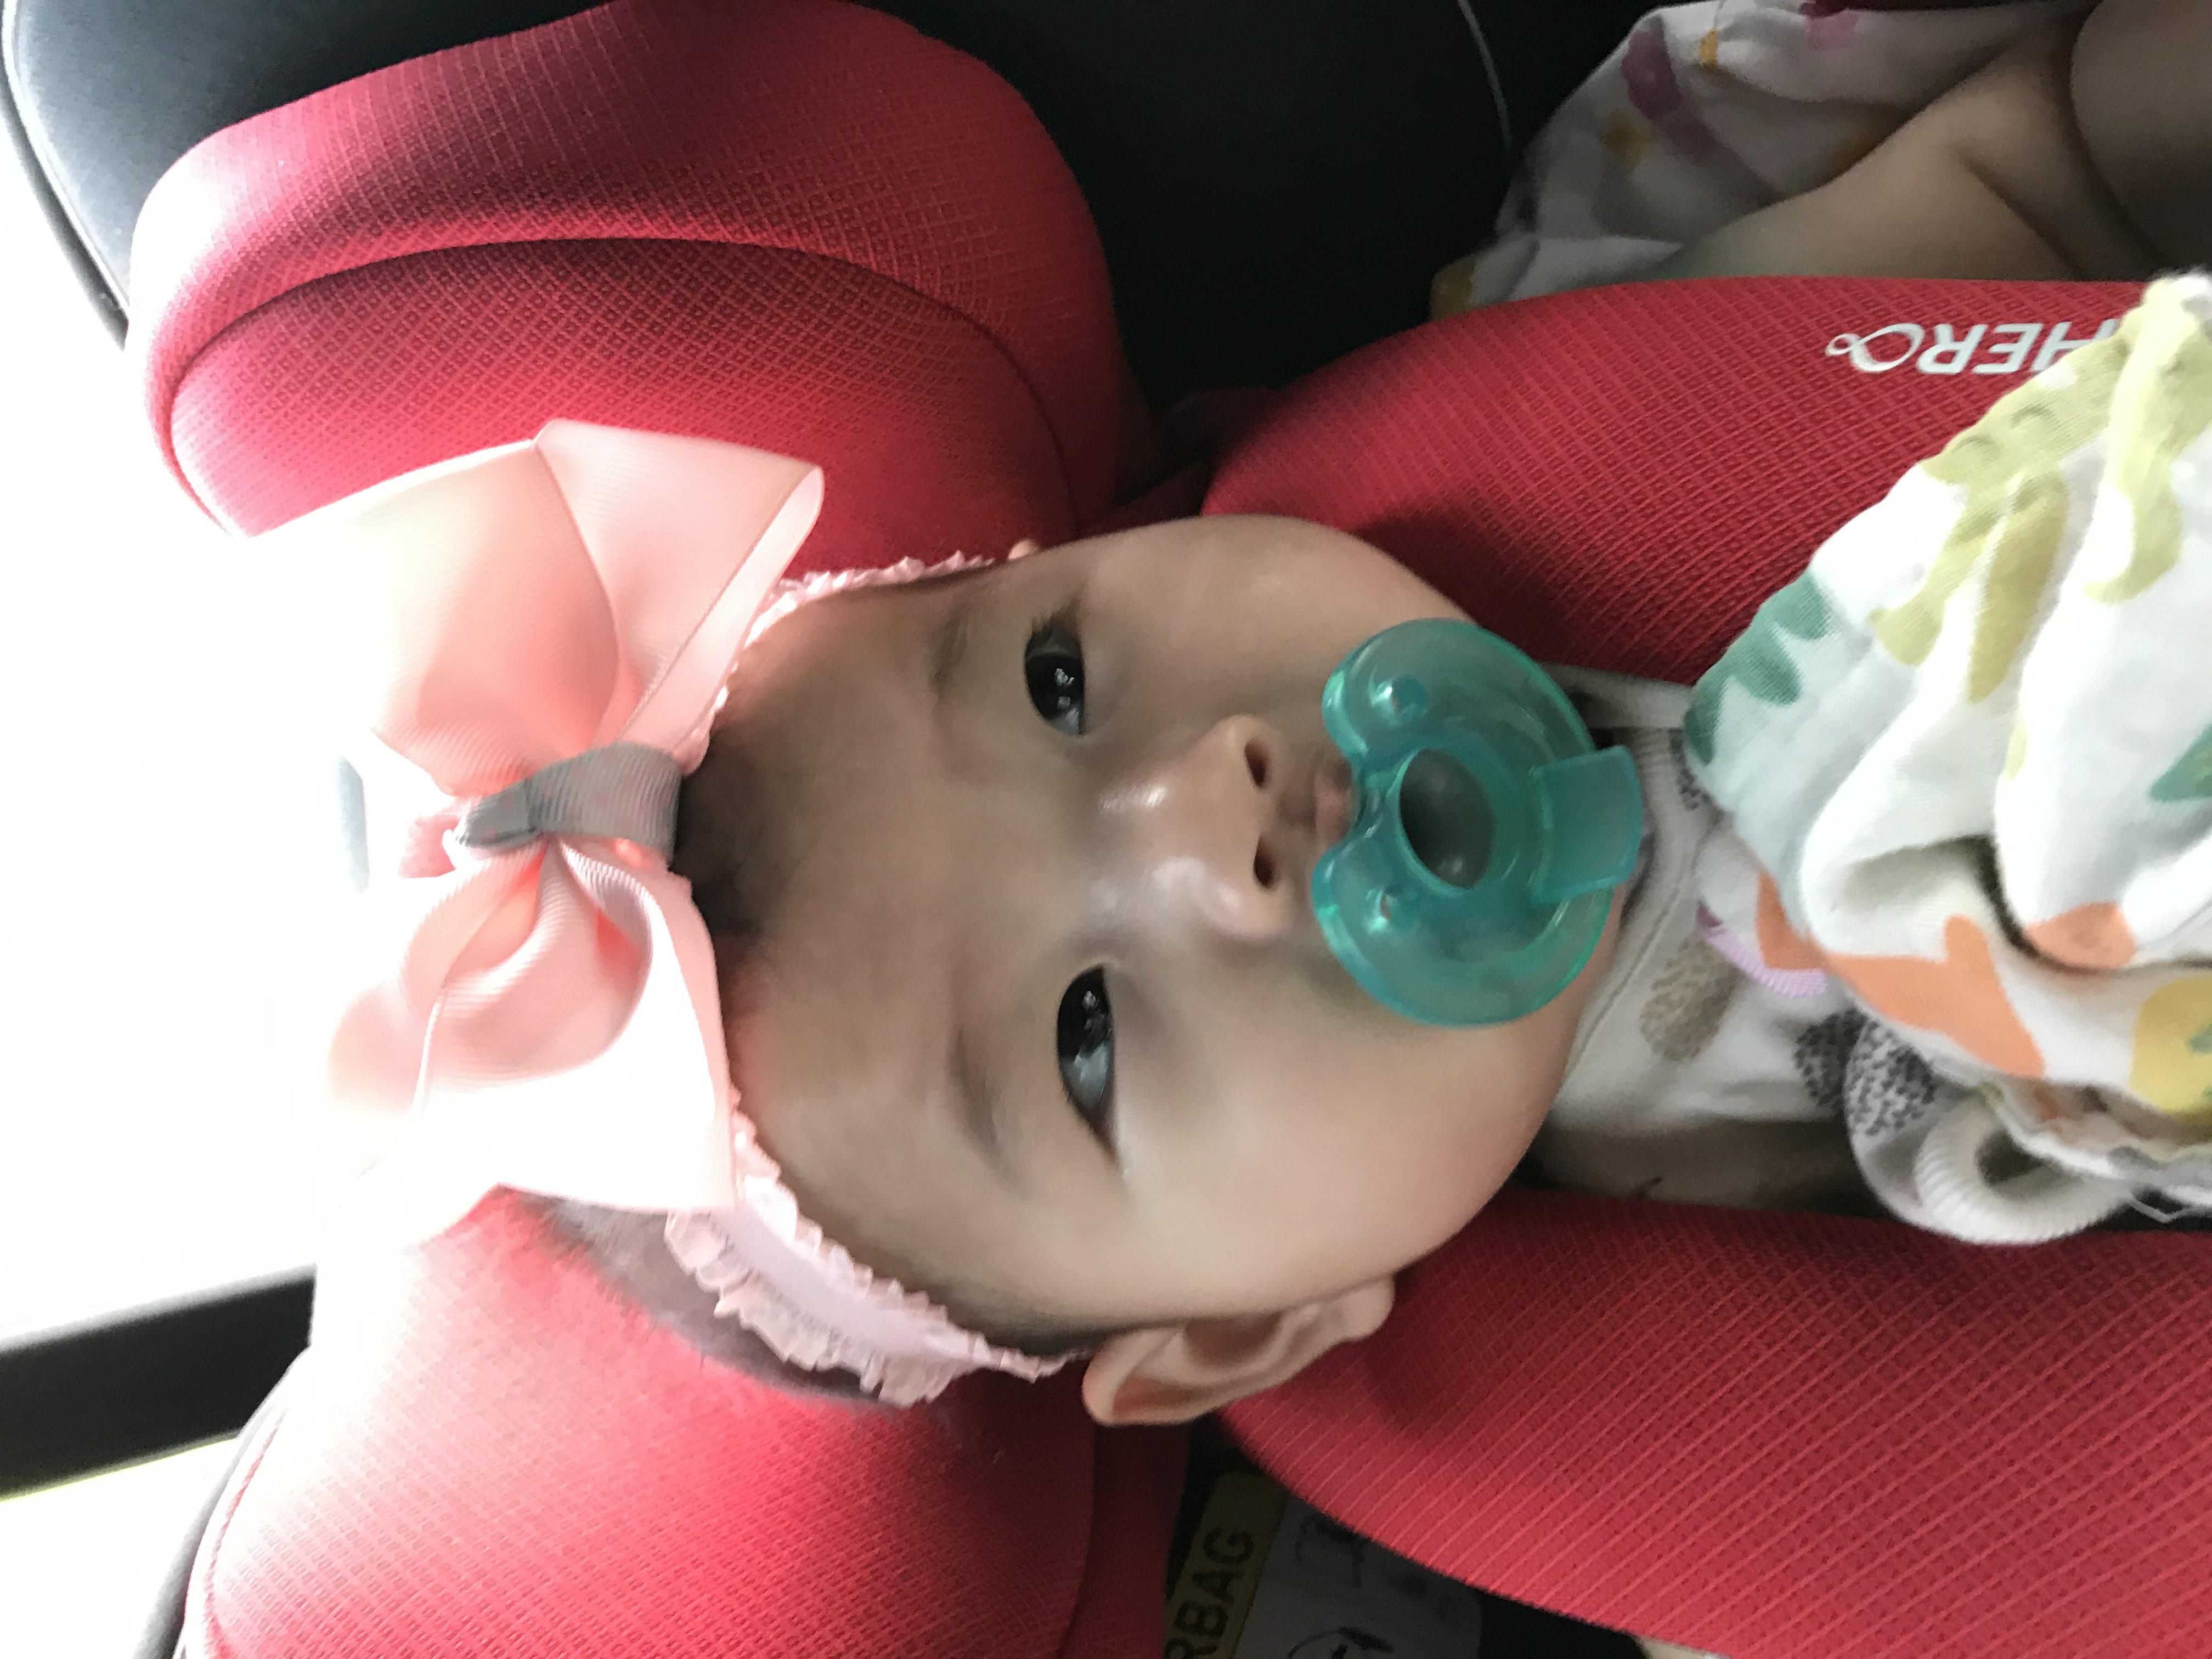 Touch嬰兒紙尿褲